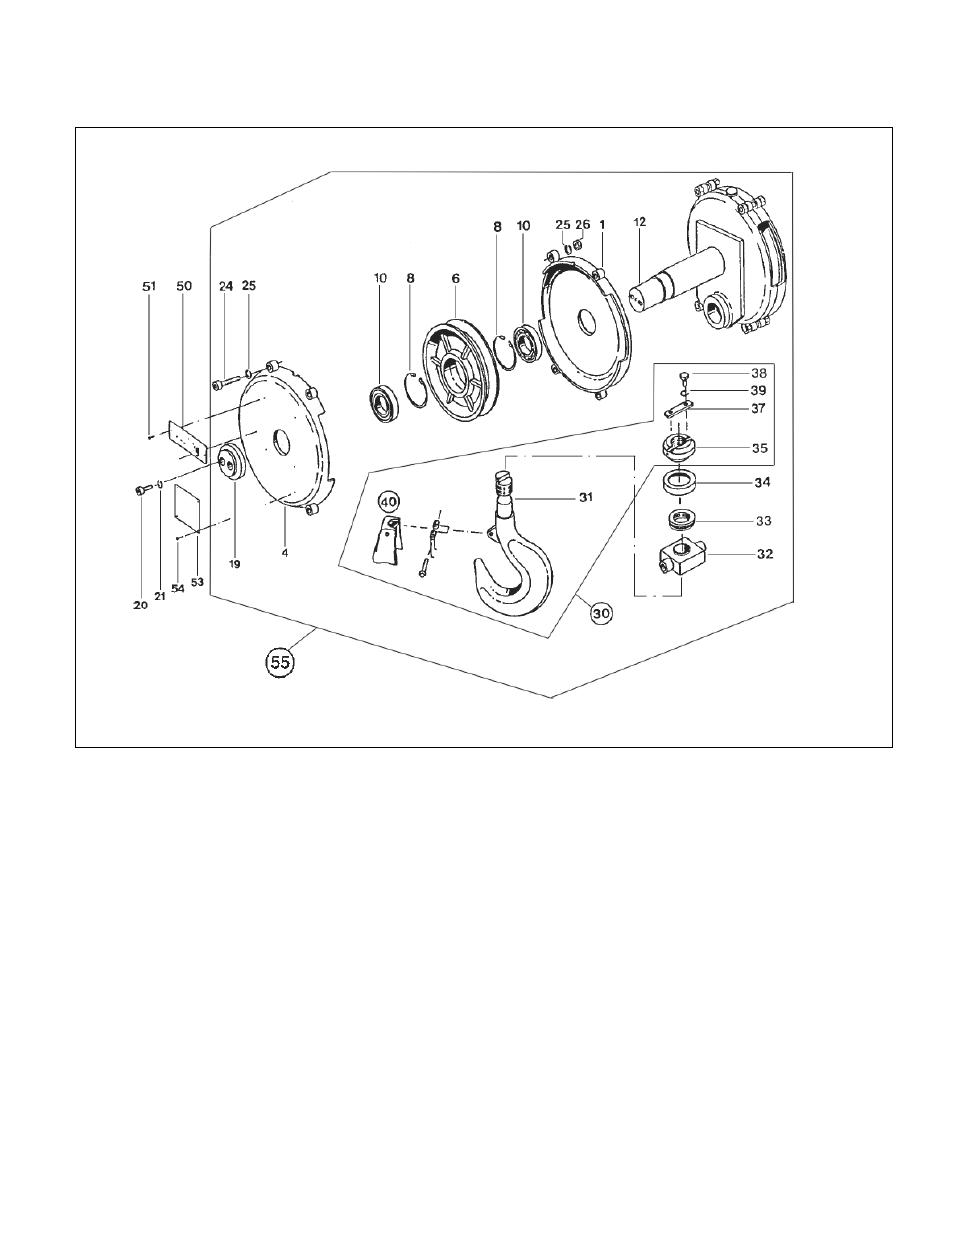 hight resolution of wire rope hoist wiring diagram wiring library cm hoist wiring diagram b 28075